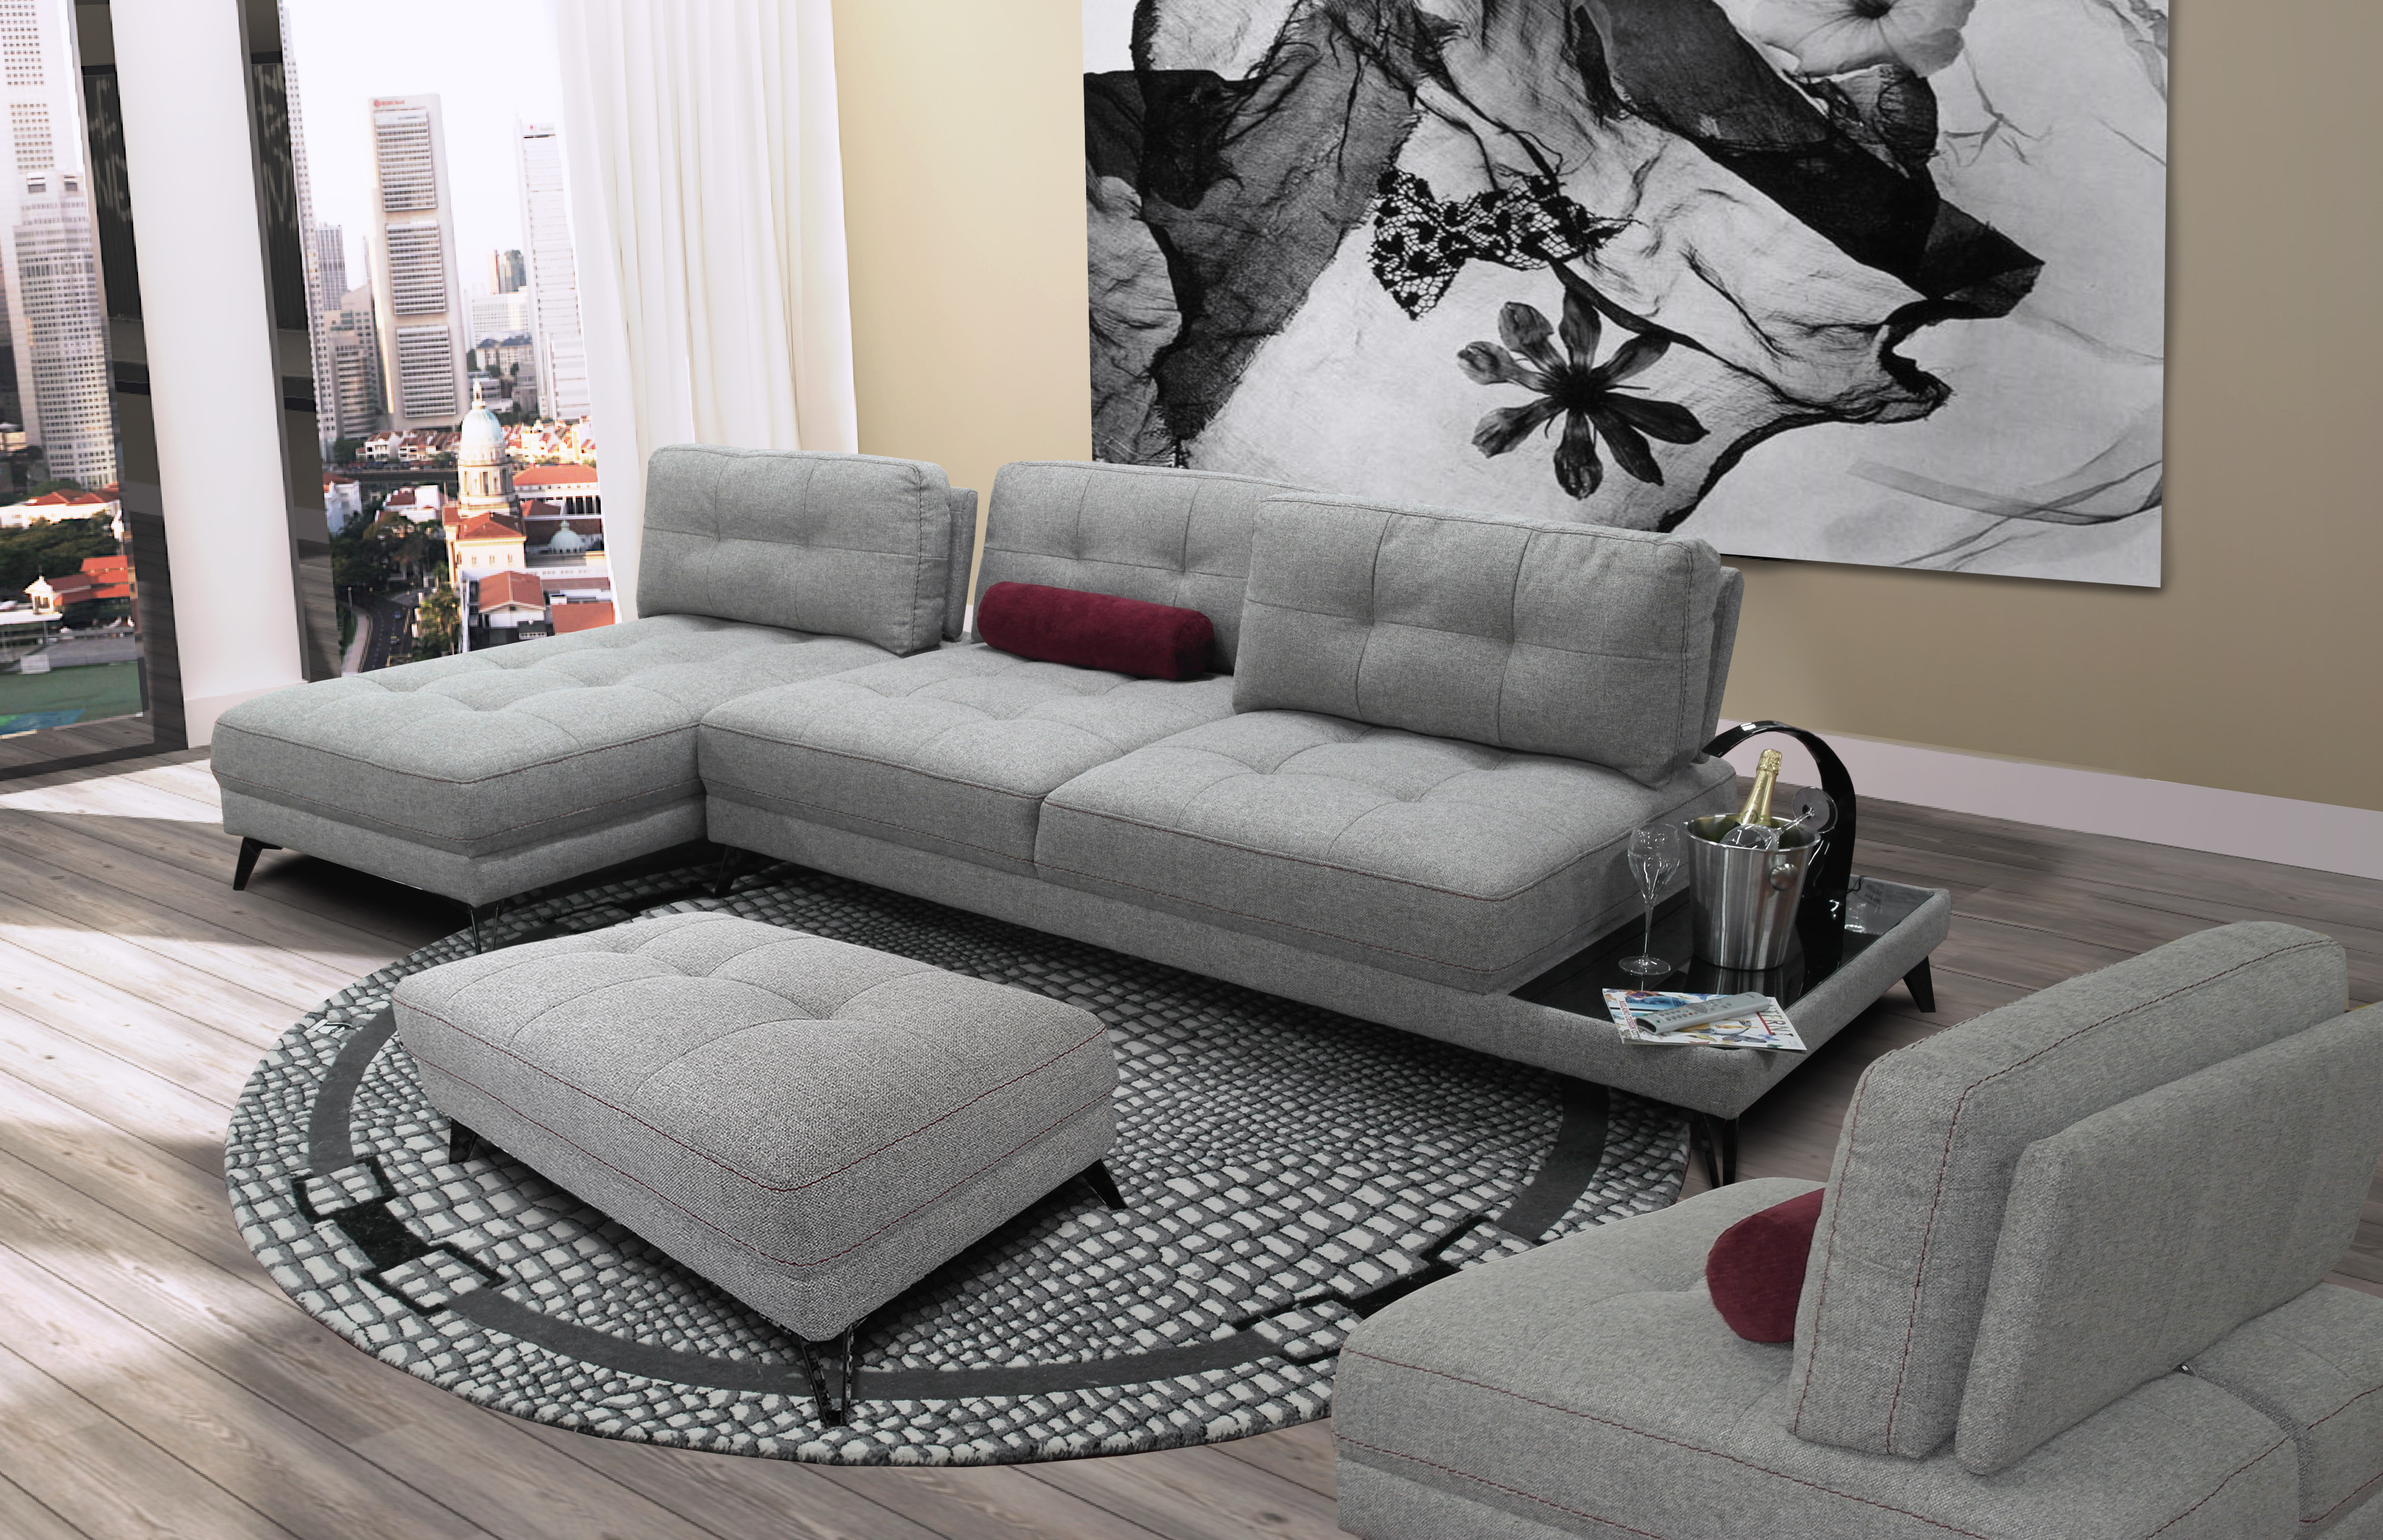 Groovy Sofa Nieri Modern Long Island Interior Design Ideas Clesiryabchikinfo